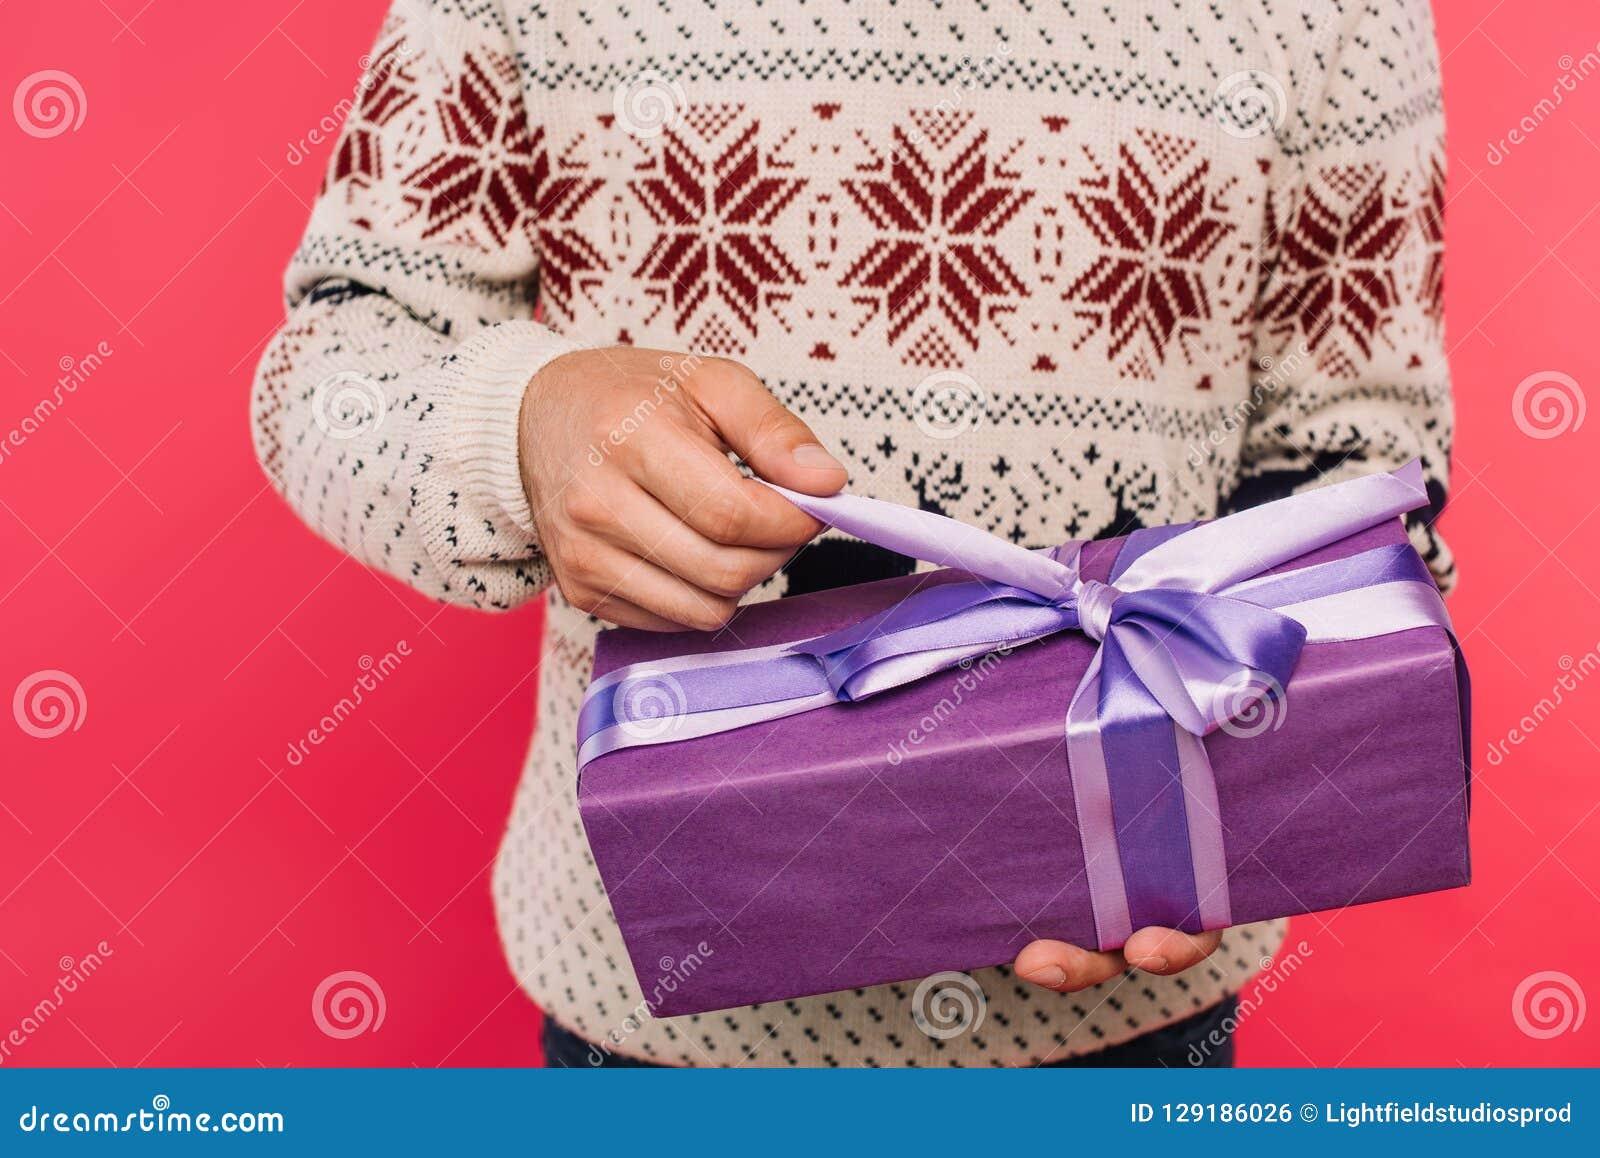 cropped image of man opening gift box